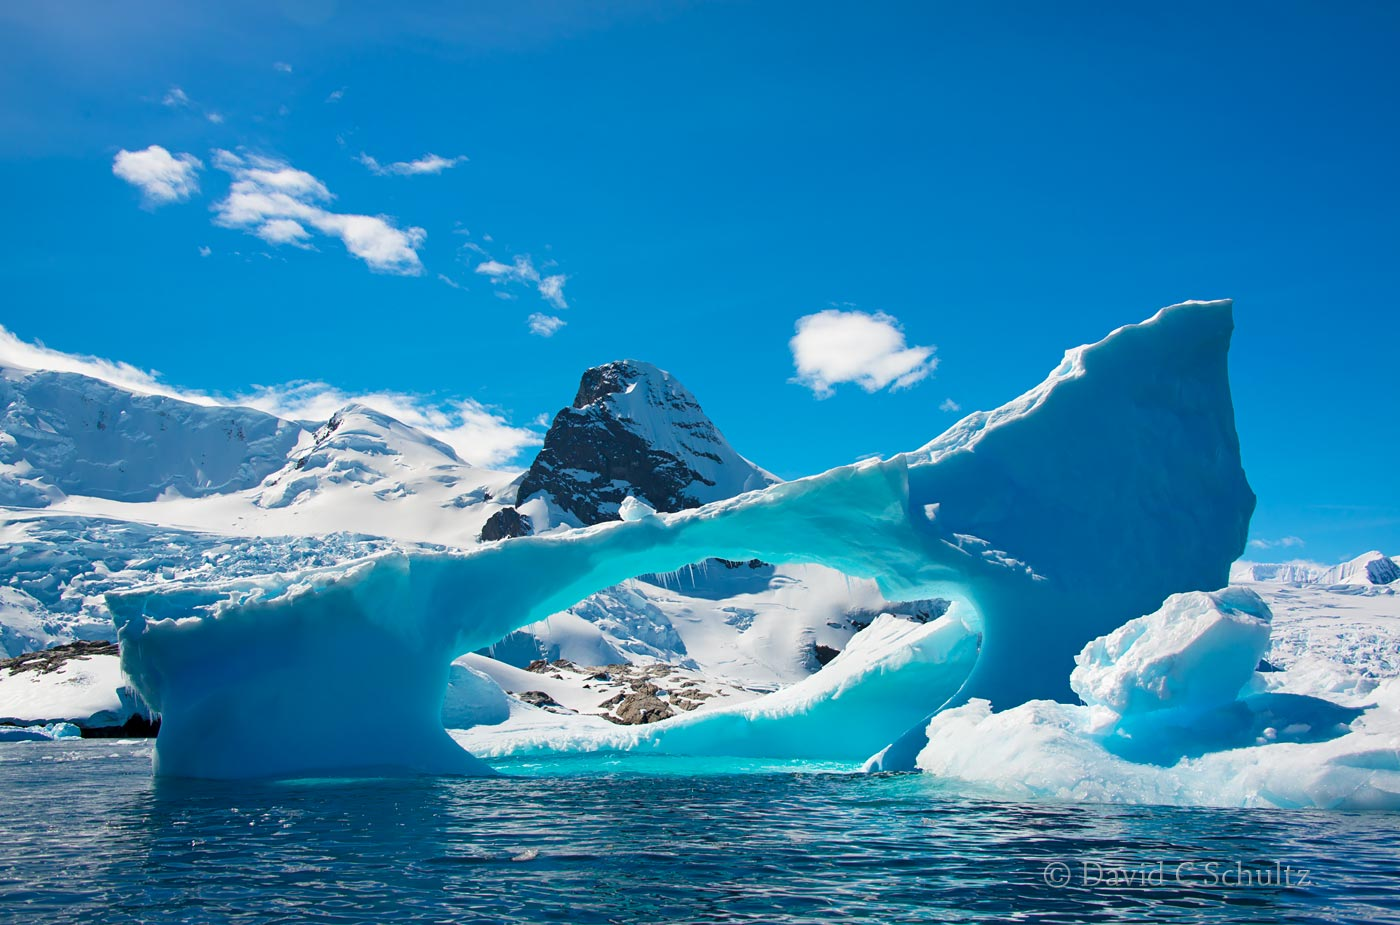 Antarctica iceberg - Image #167-2870